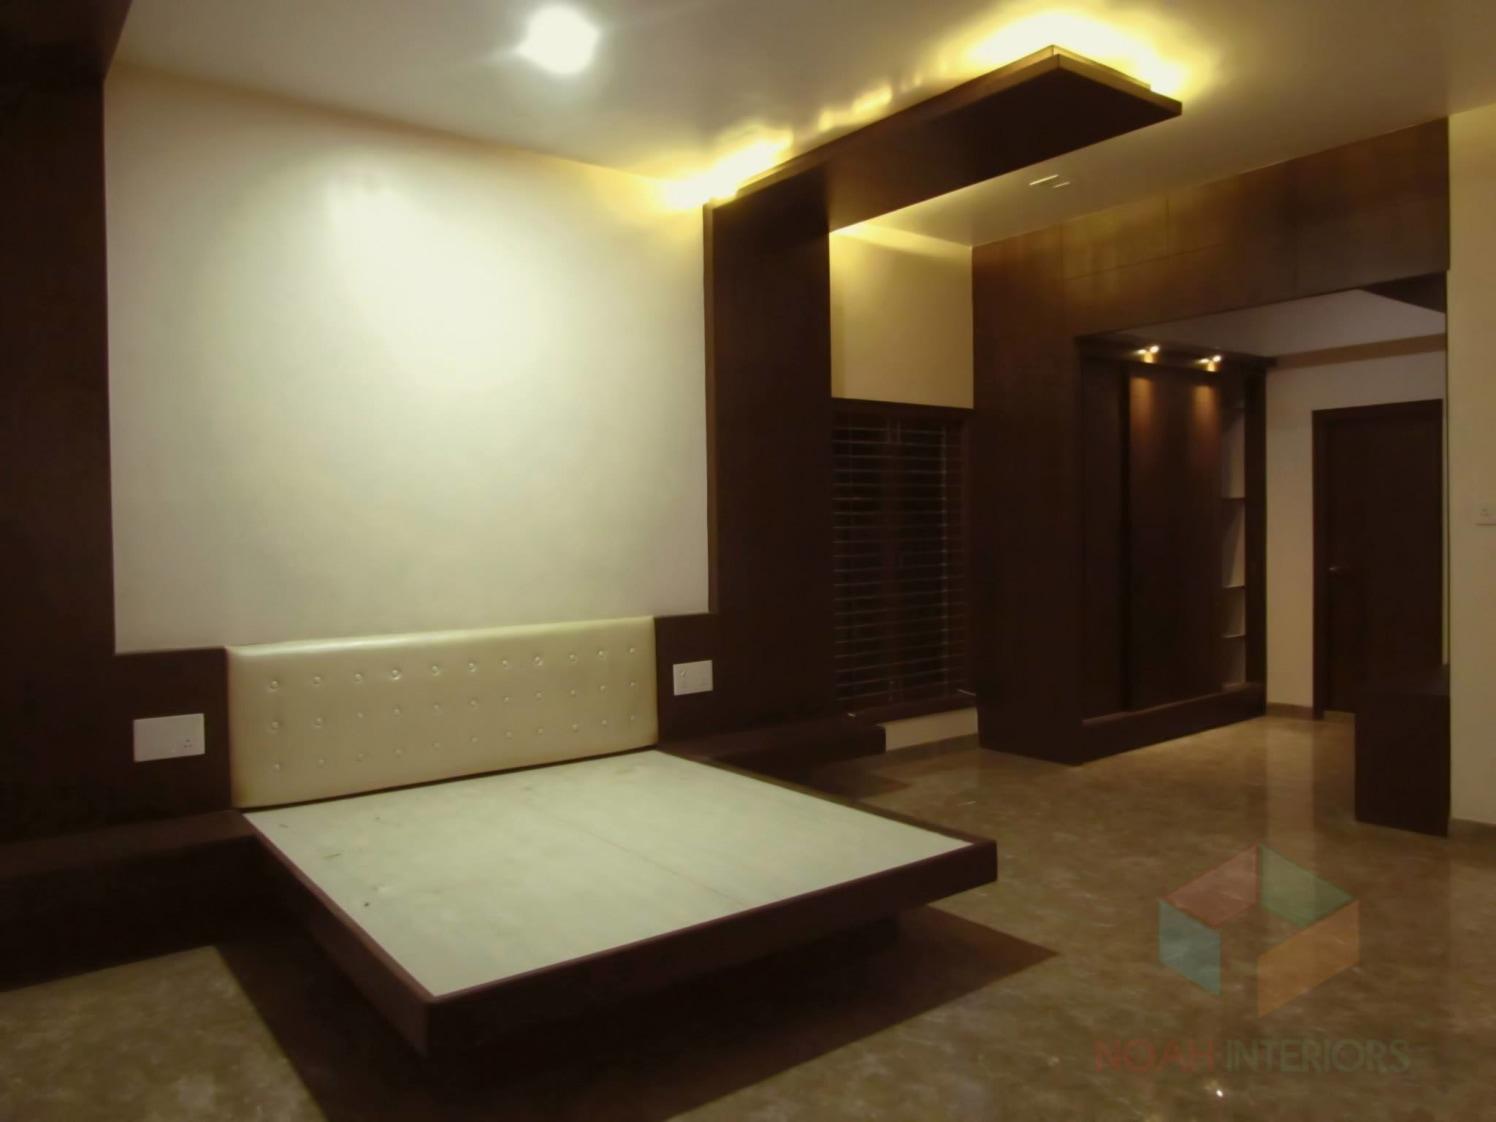 Bedroom with marble flooring by Noah Interiors  Bedroom Modern | Interior Design Photos & Ideas